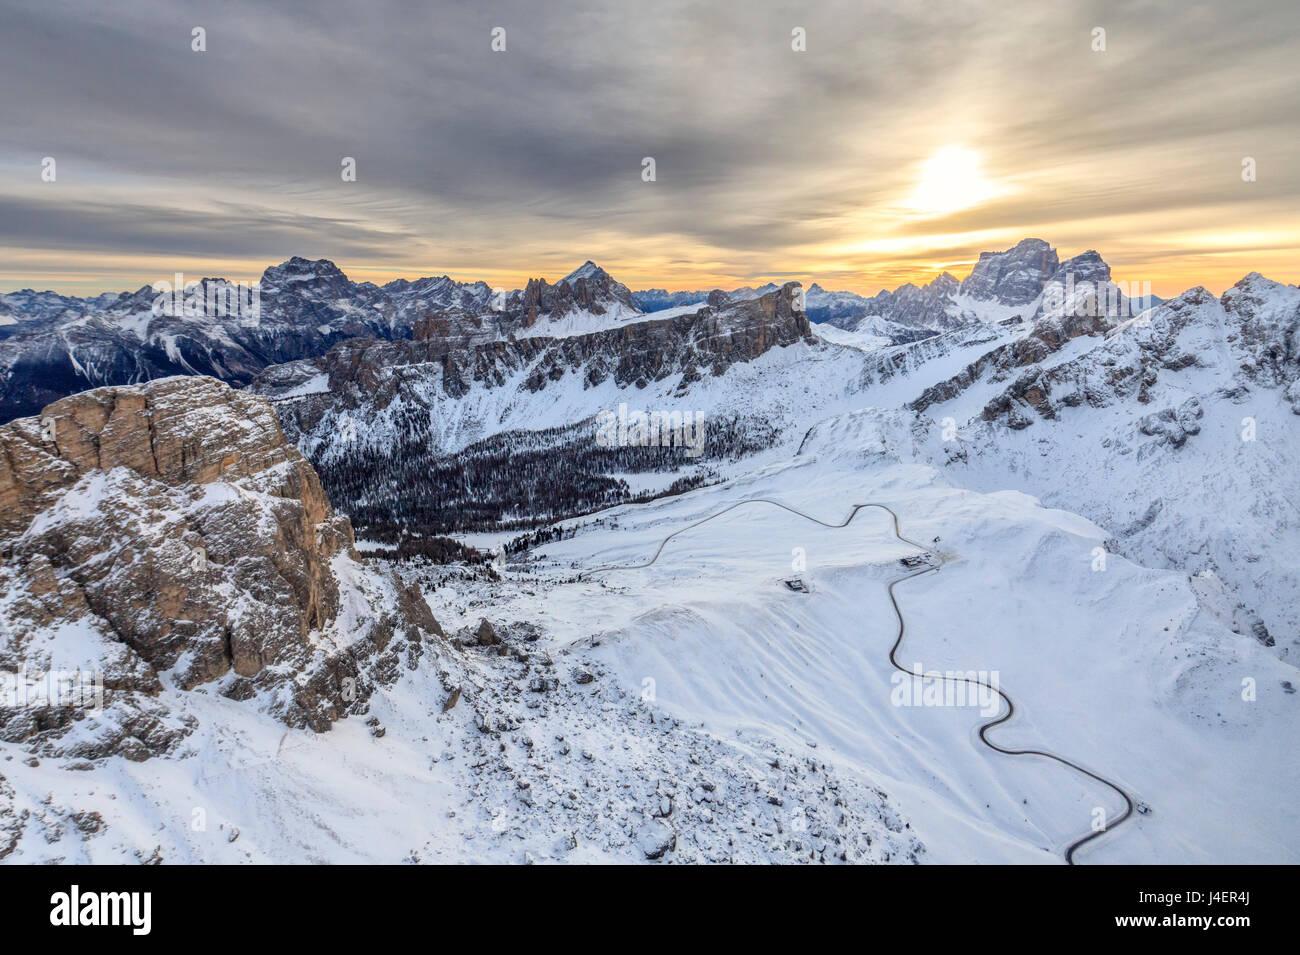 Aerial view of the snowy peaks of Giau Pass Ra Gusela and Lastoi De Formin, Cortina d'Ampezzo, Dolomites, Veneto, - Stock Image